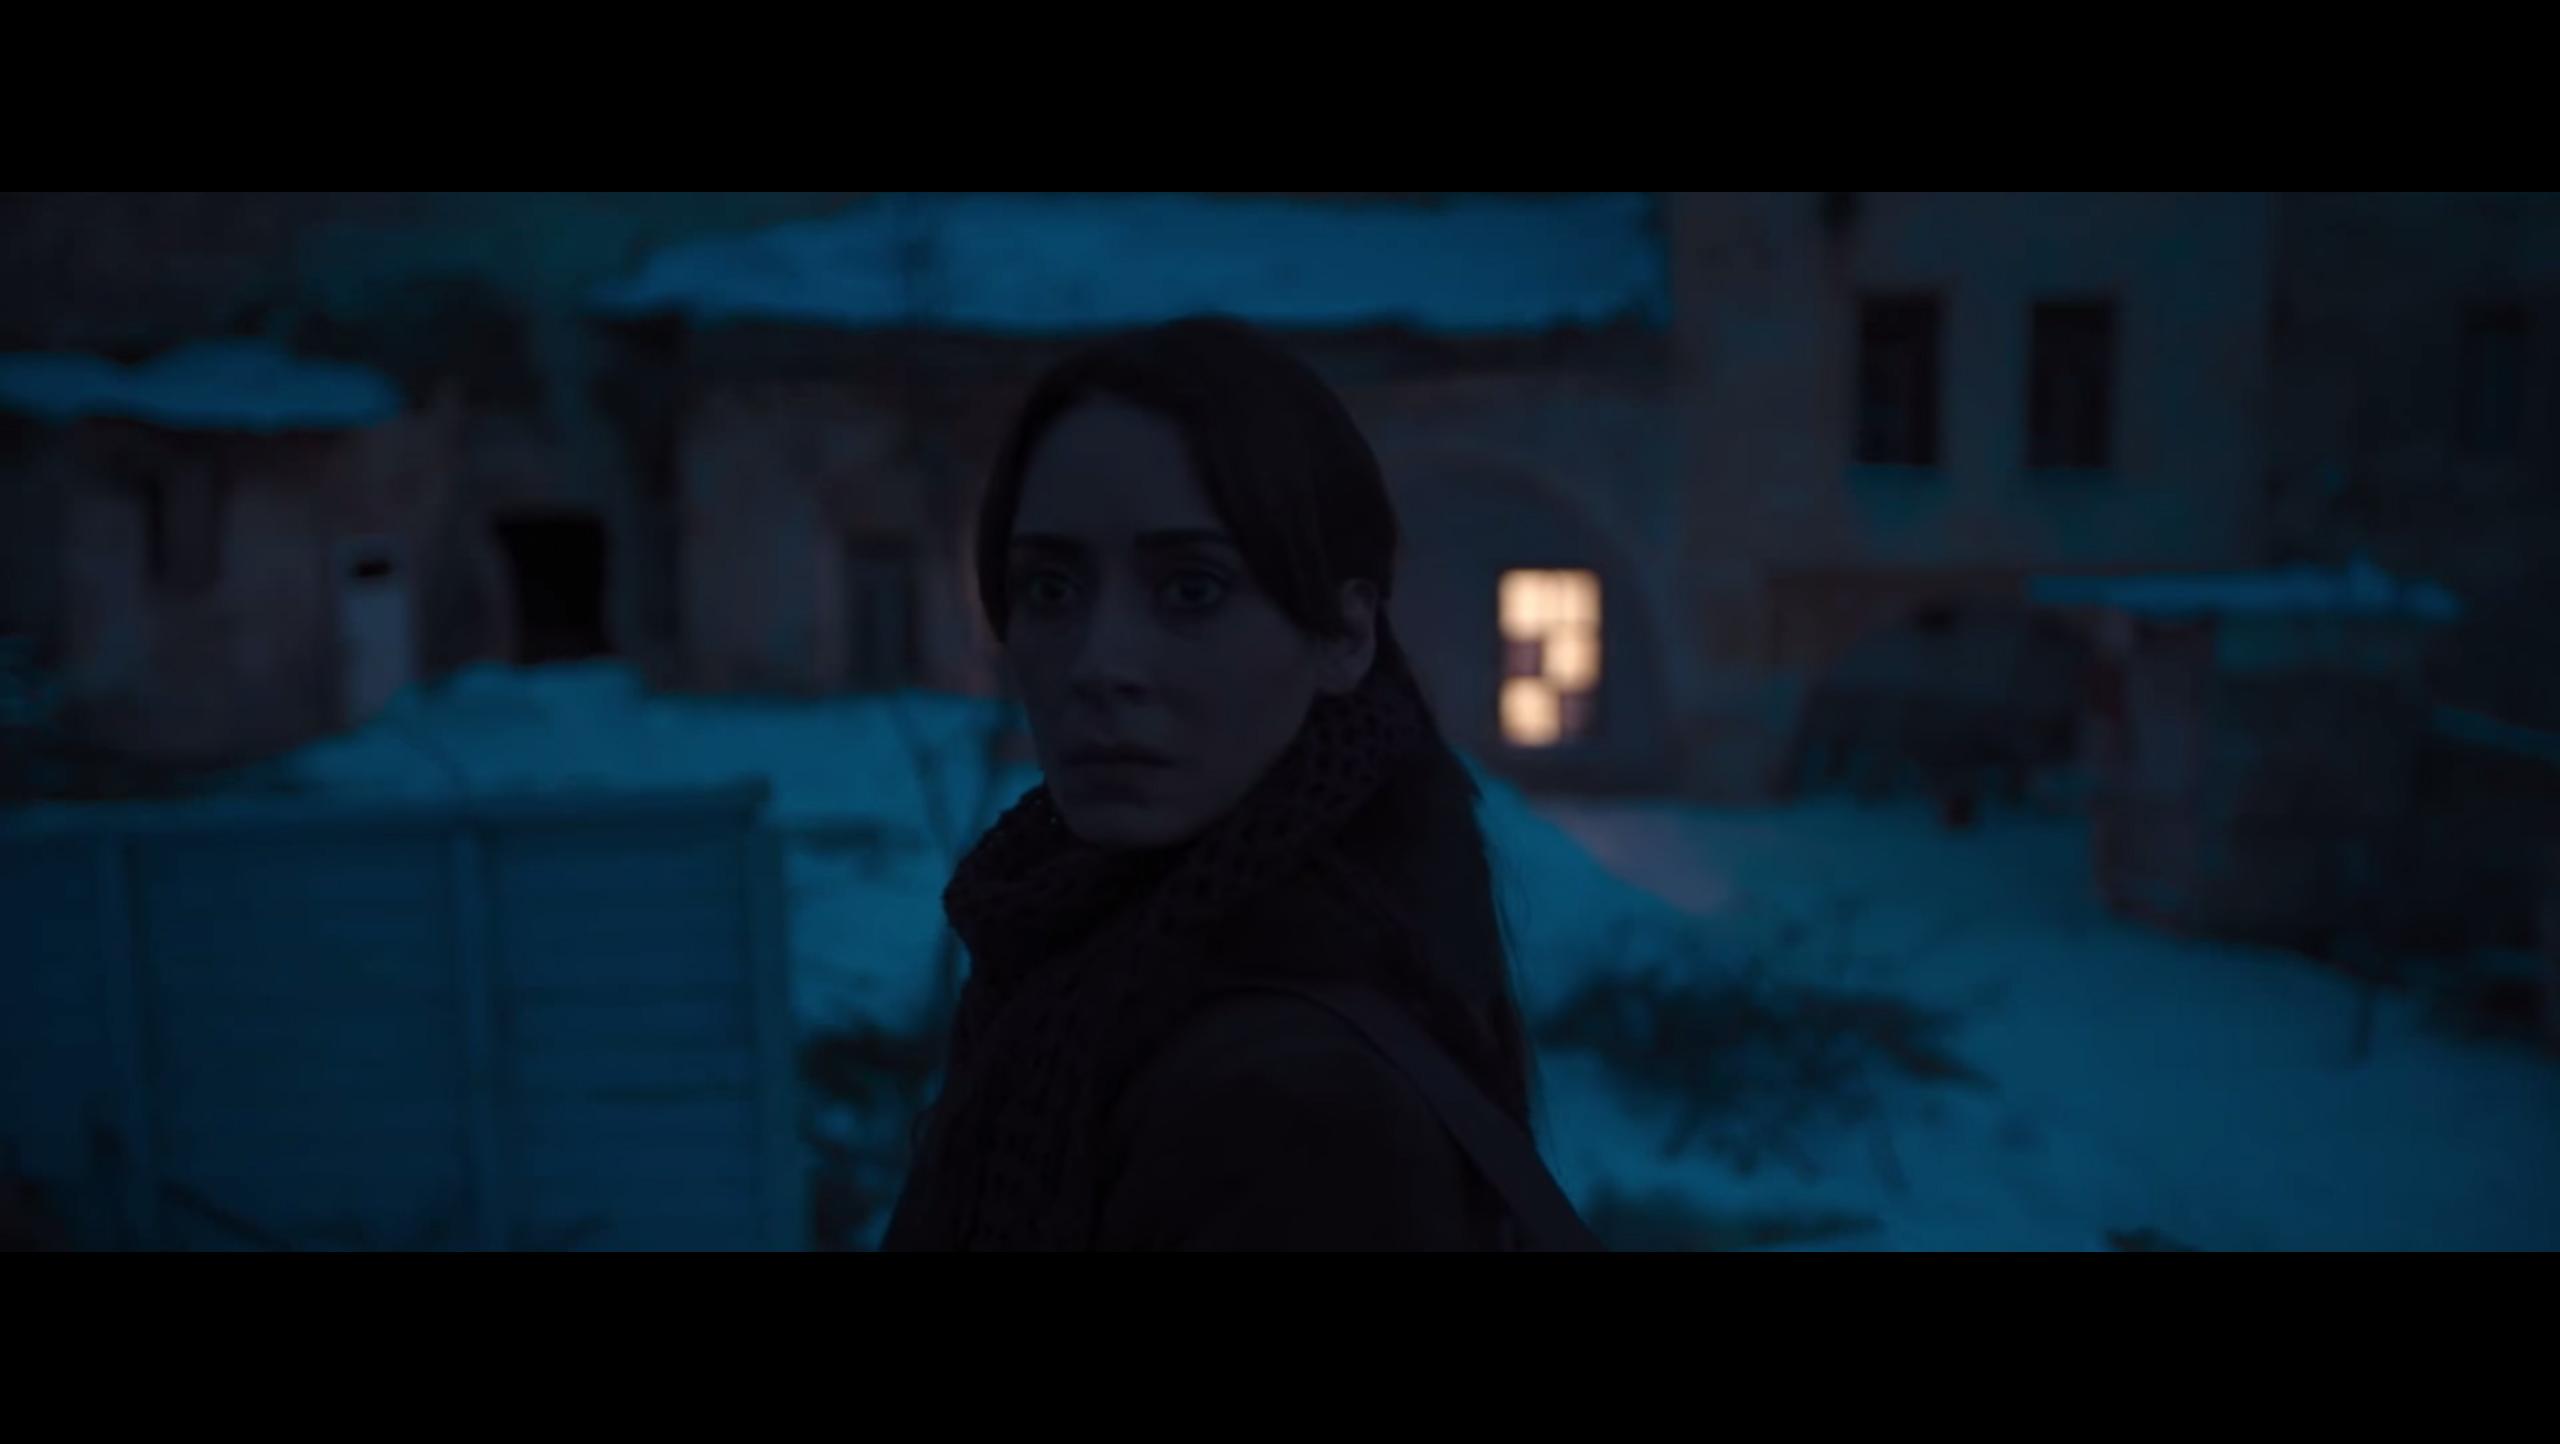 winterschlaf-film-screenshot-01_renk